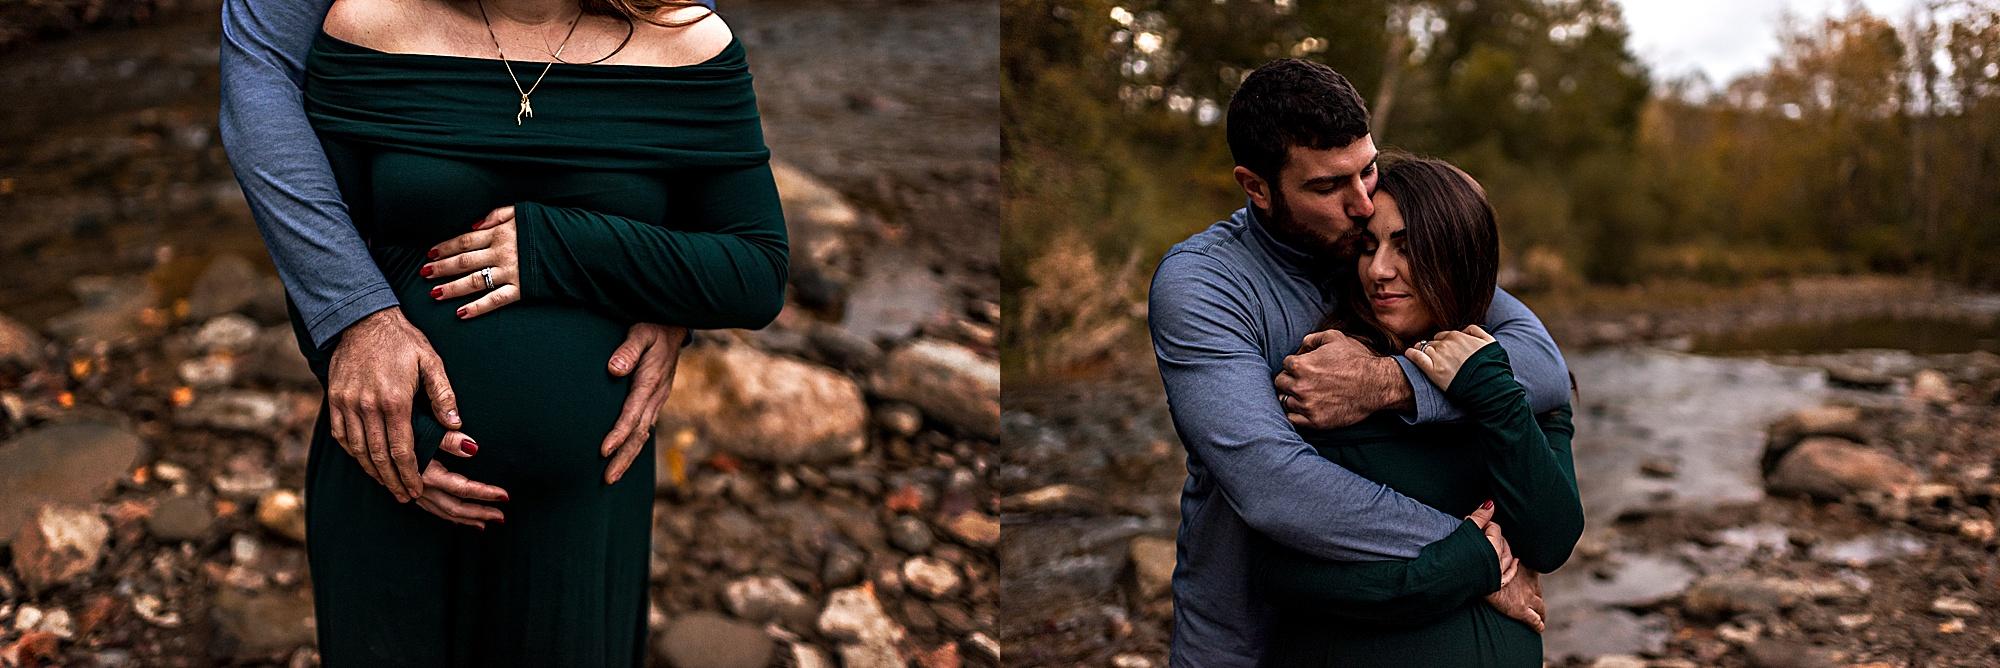 lauren-grayson-photography-akron-ohio-maternity-session-fall-hammer_0034.jpg